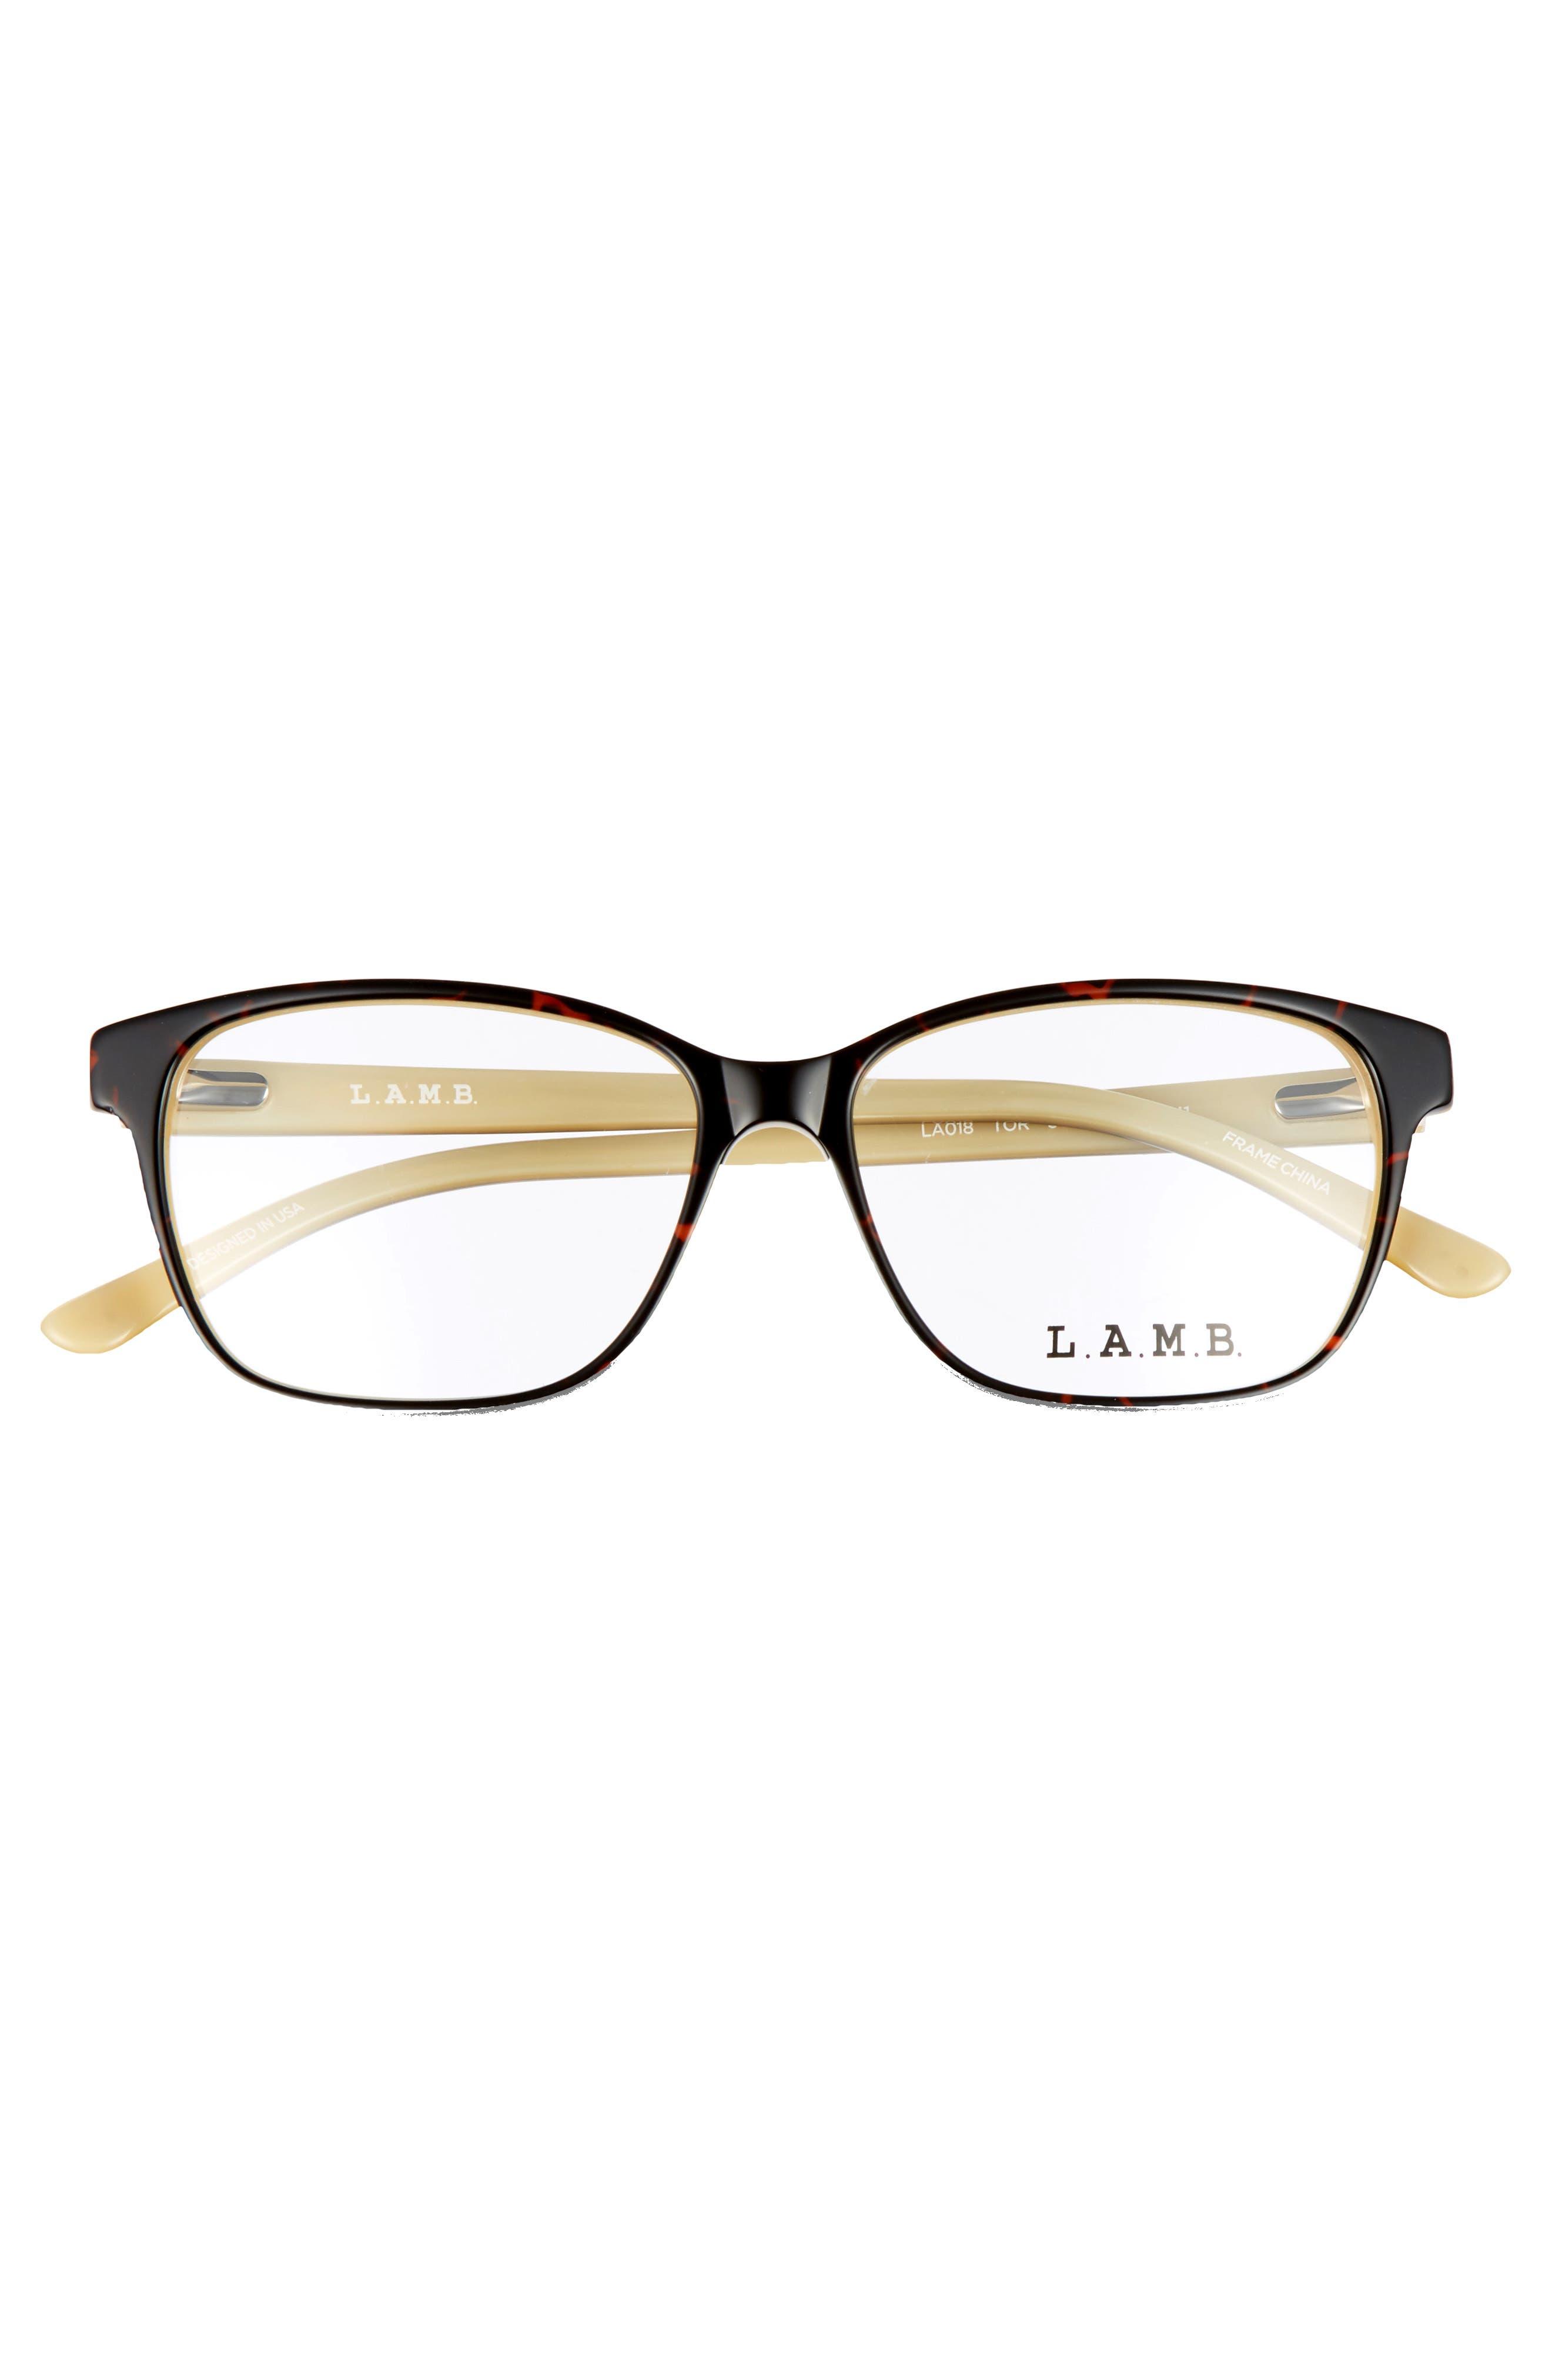 54mm Square Optical Glasses,                             Alternate thumbnail 6, color,